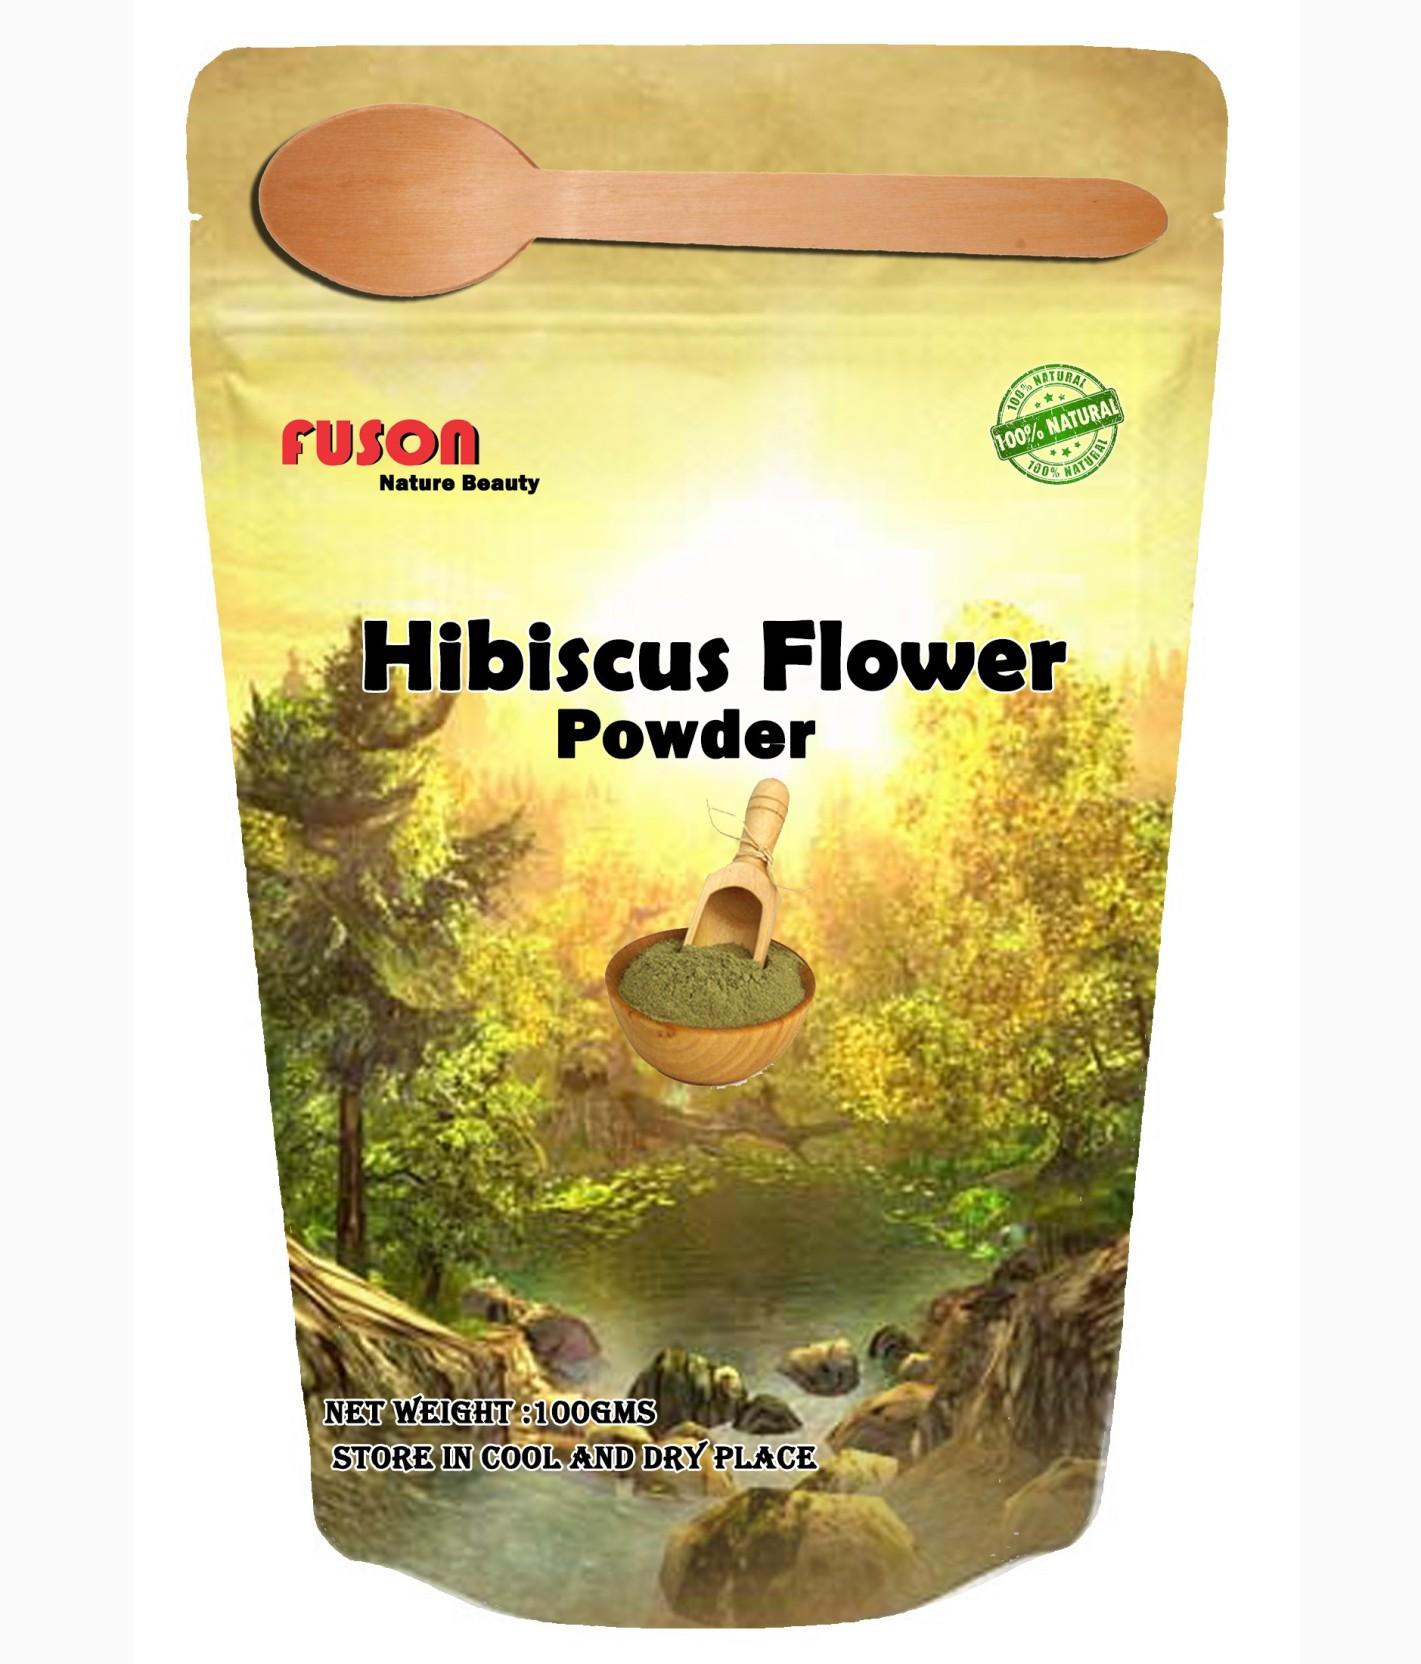 Fuson premium quality hibiscus flower powder price in india buy fuson premium quality hibiscus flower powder add to cart izmirmasajfo